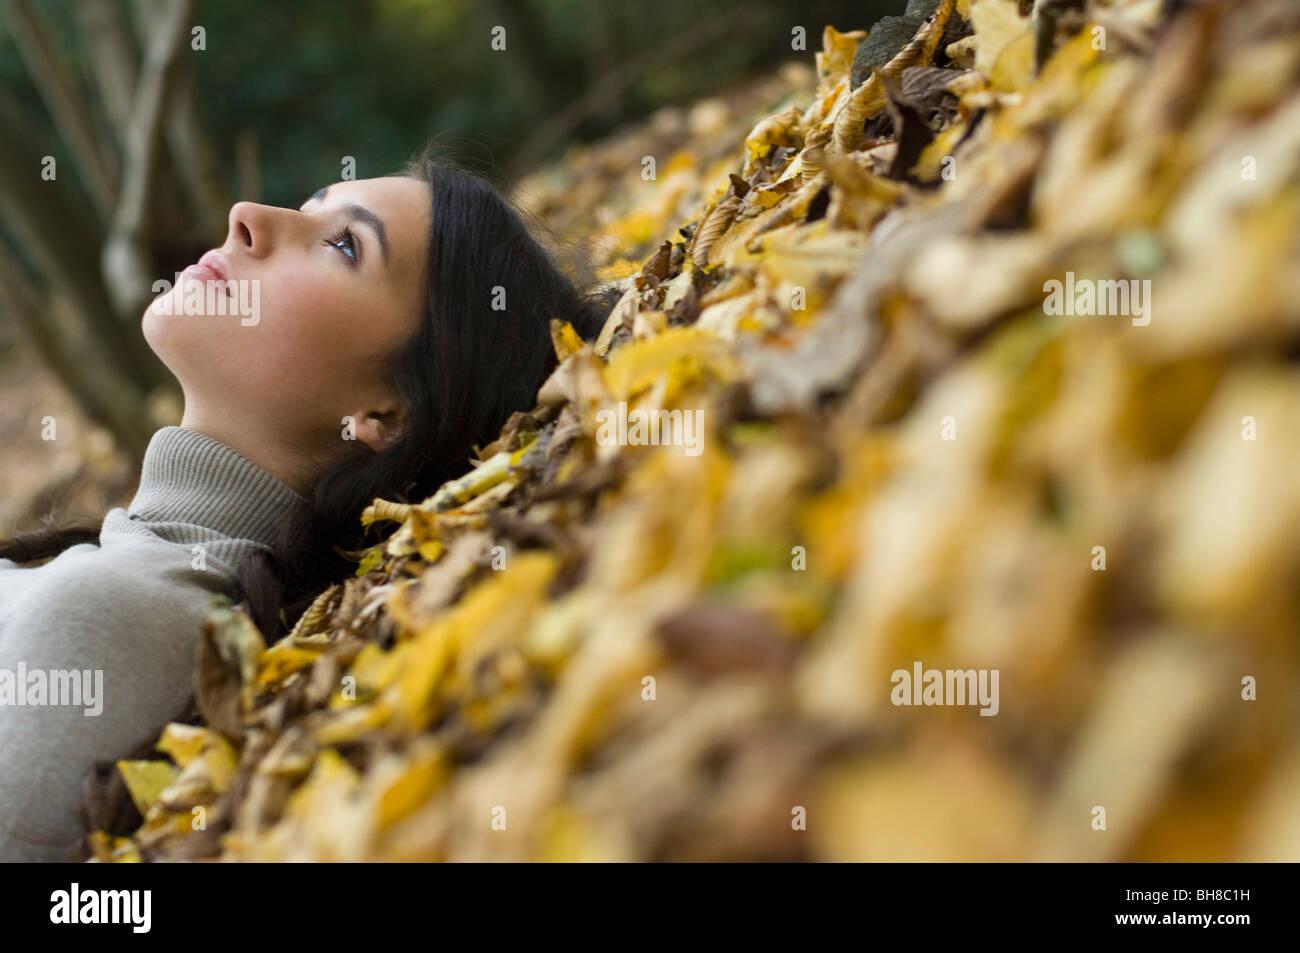 girl on leaves - Stock Image